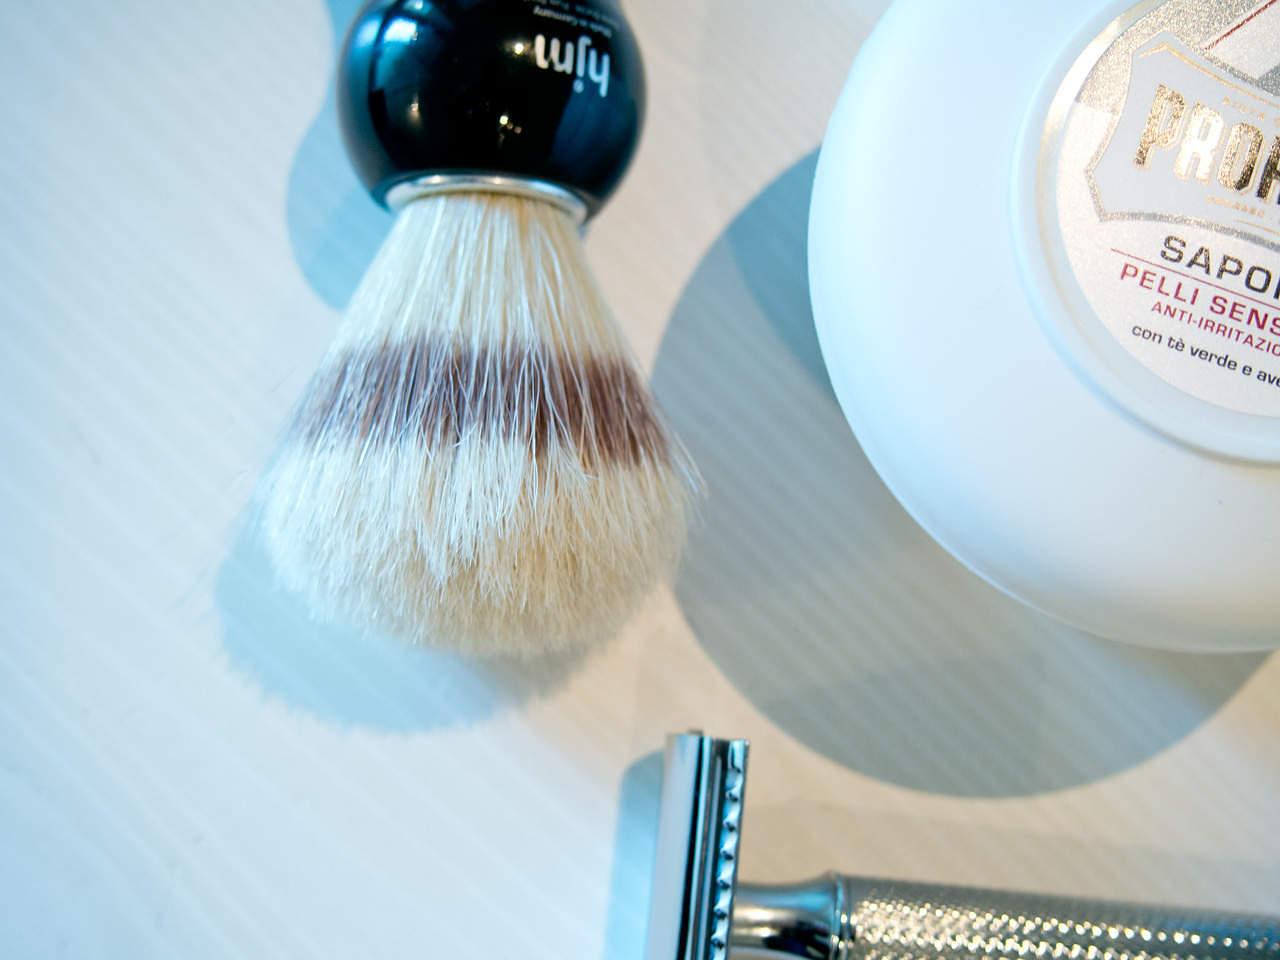 classic-shaving-kit-brush